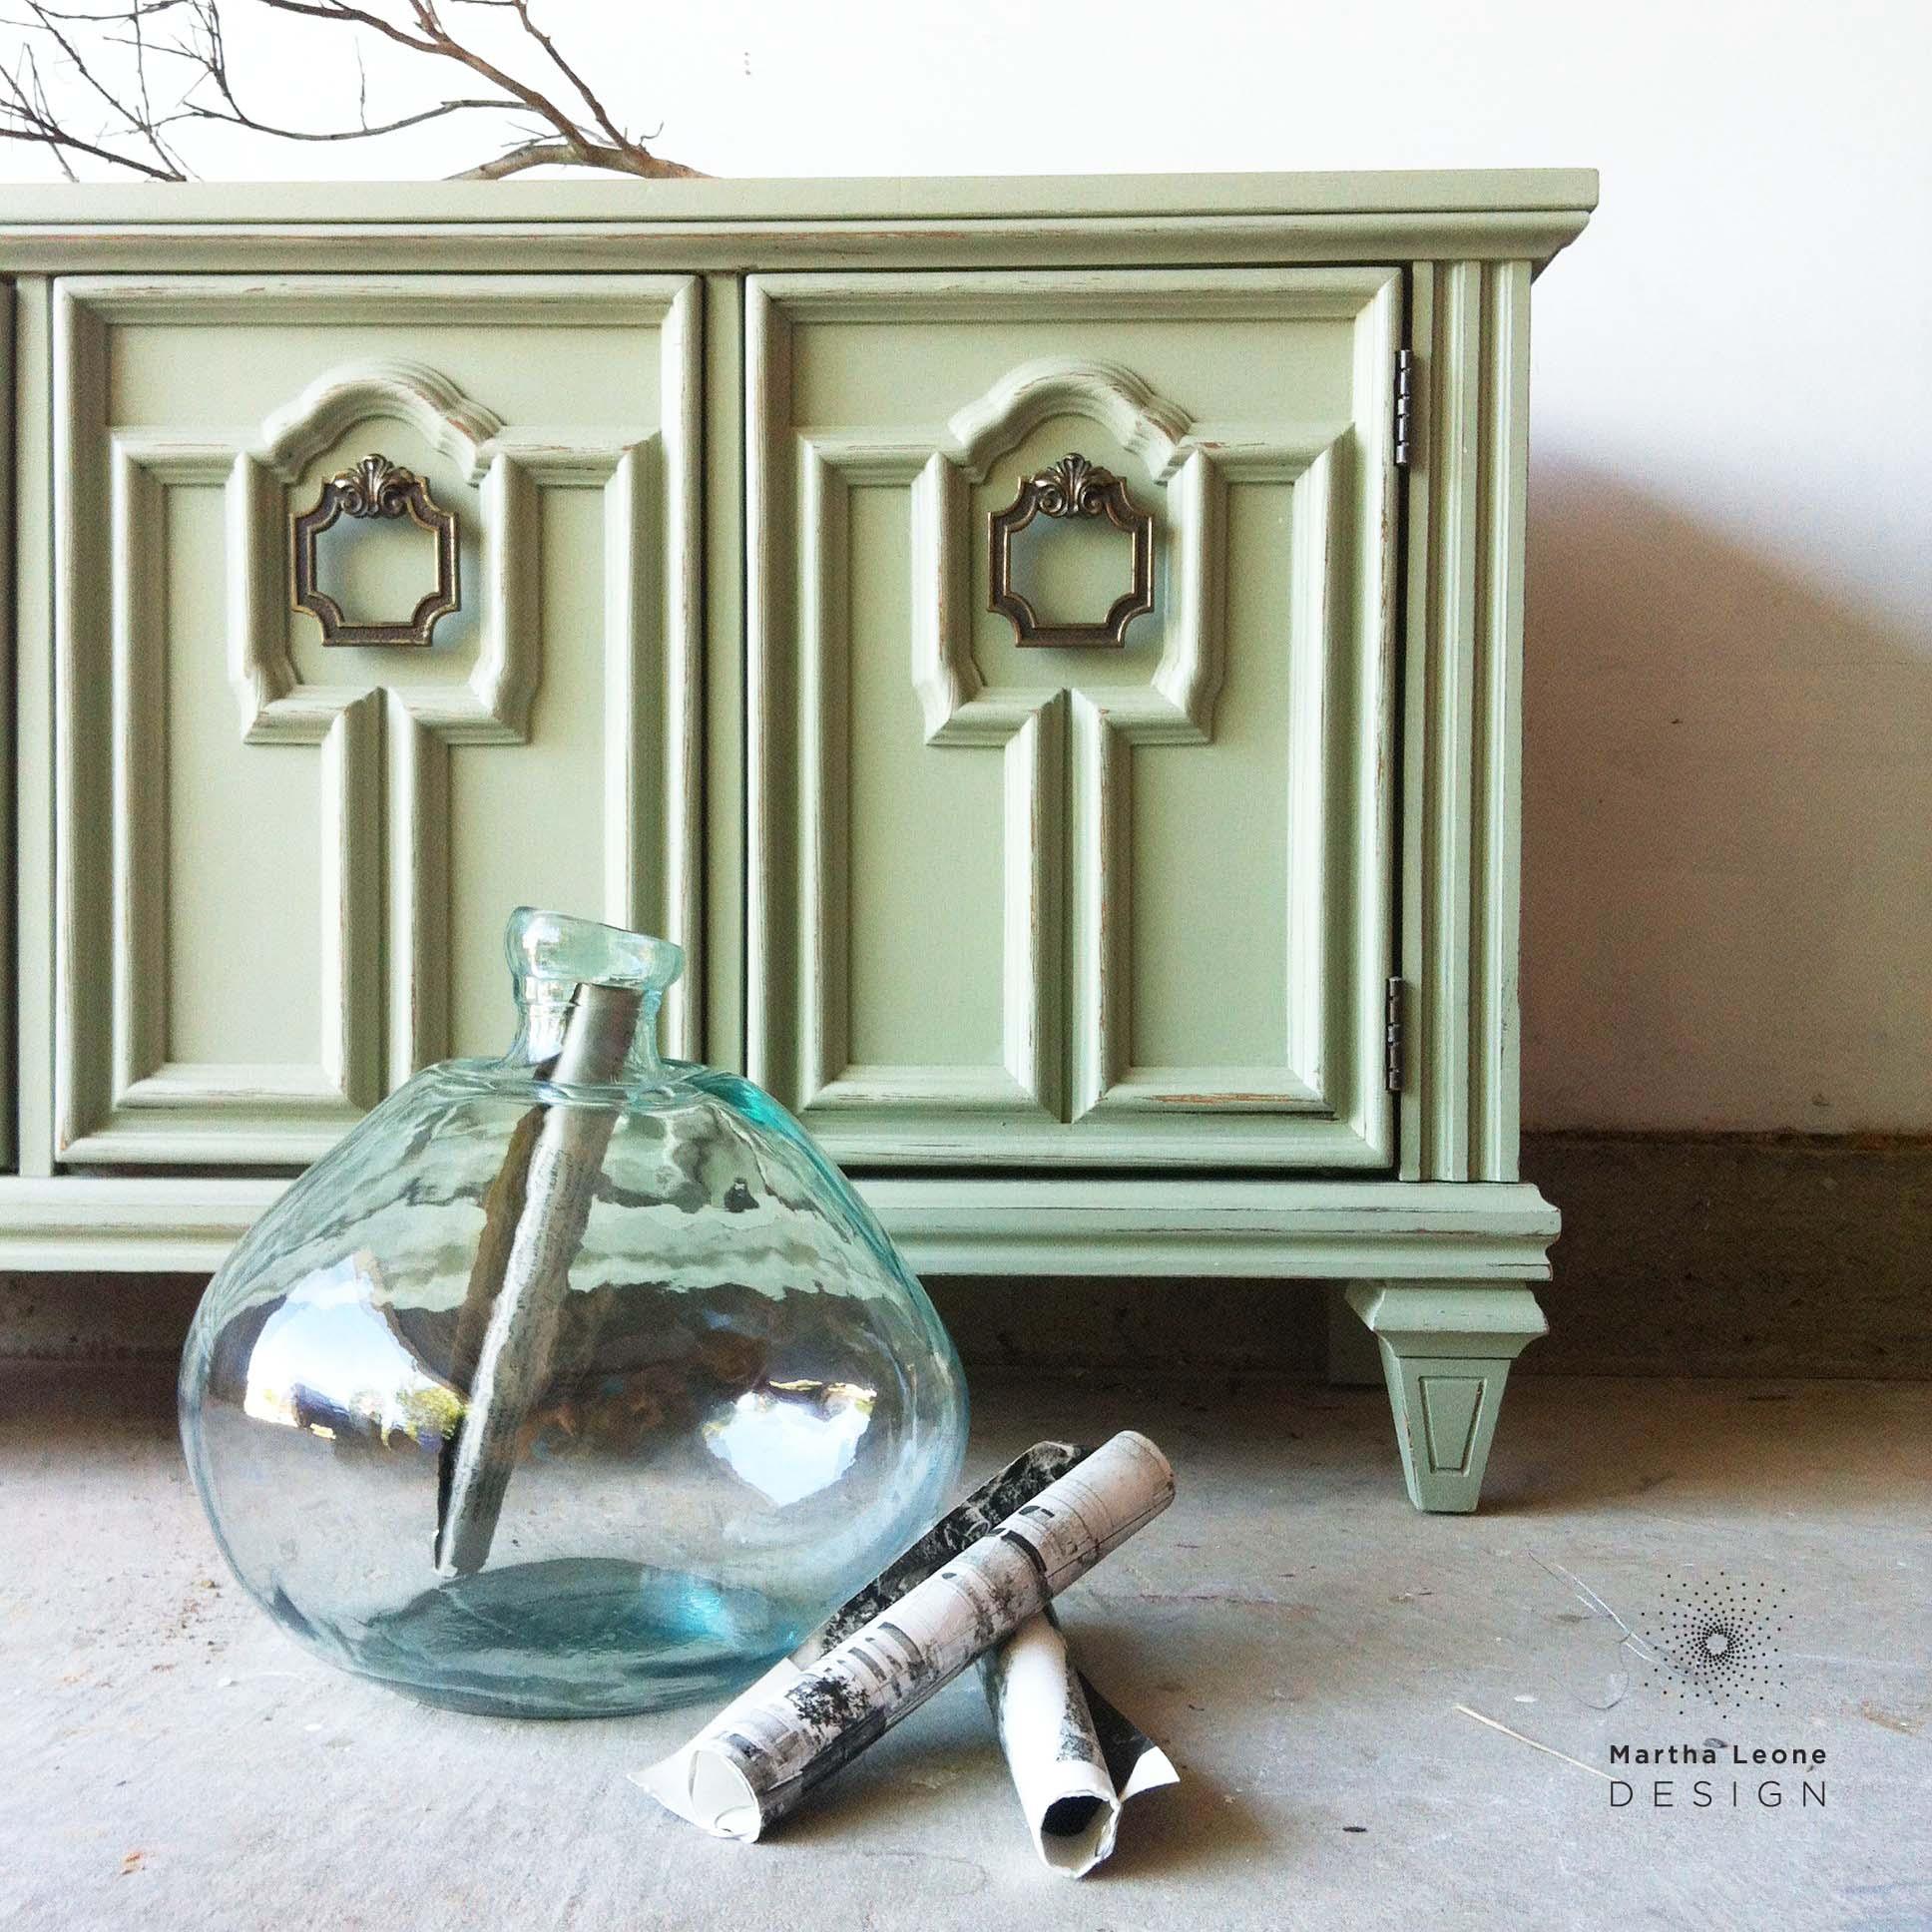 Green Cabinet2 Martha Leone Design.jpg